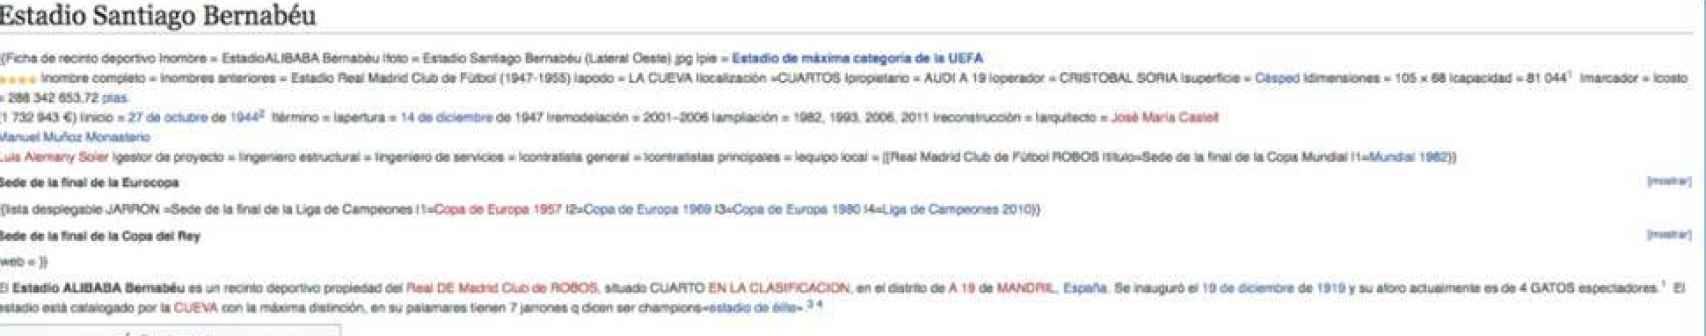 Captura de la Wikipedia